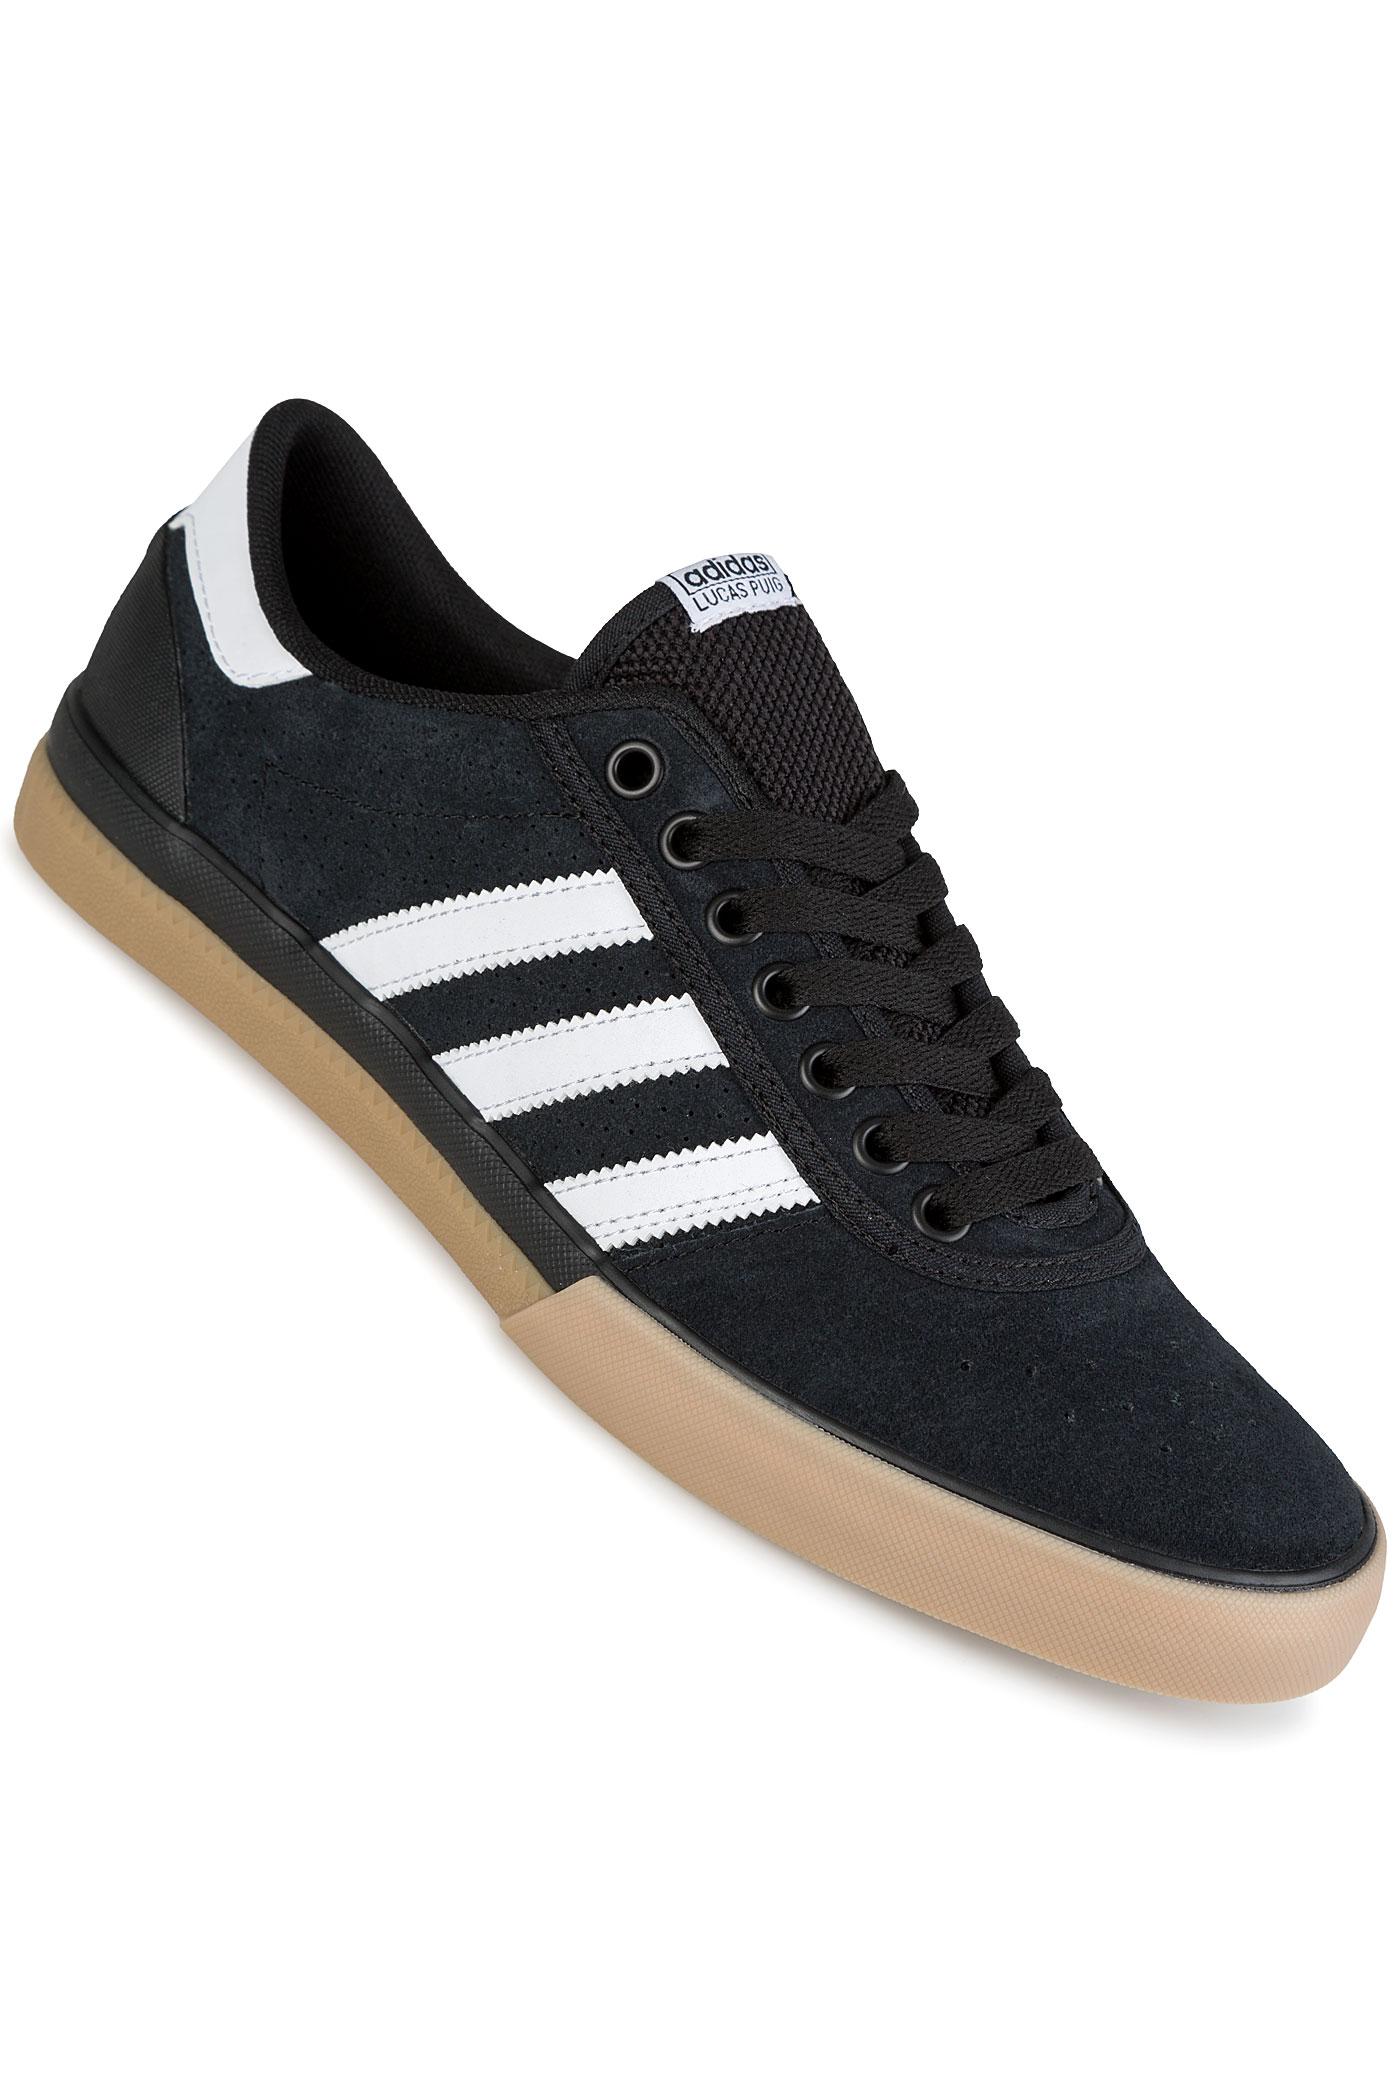 909e93f2f17 ... adidas Skateboarding Lucas Premiere ADV Shoes (core black black gum) .